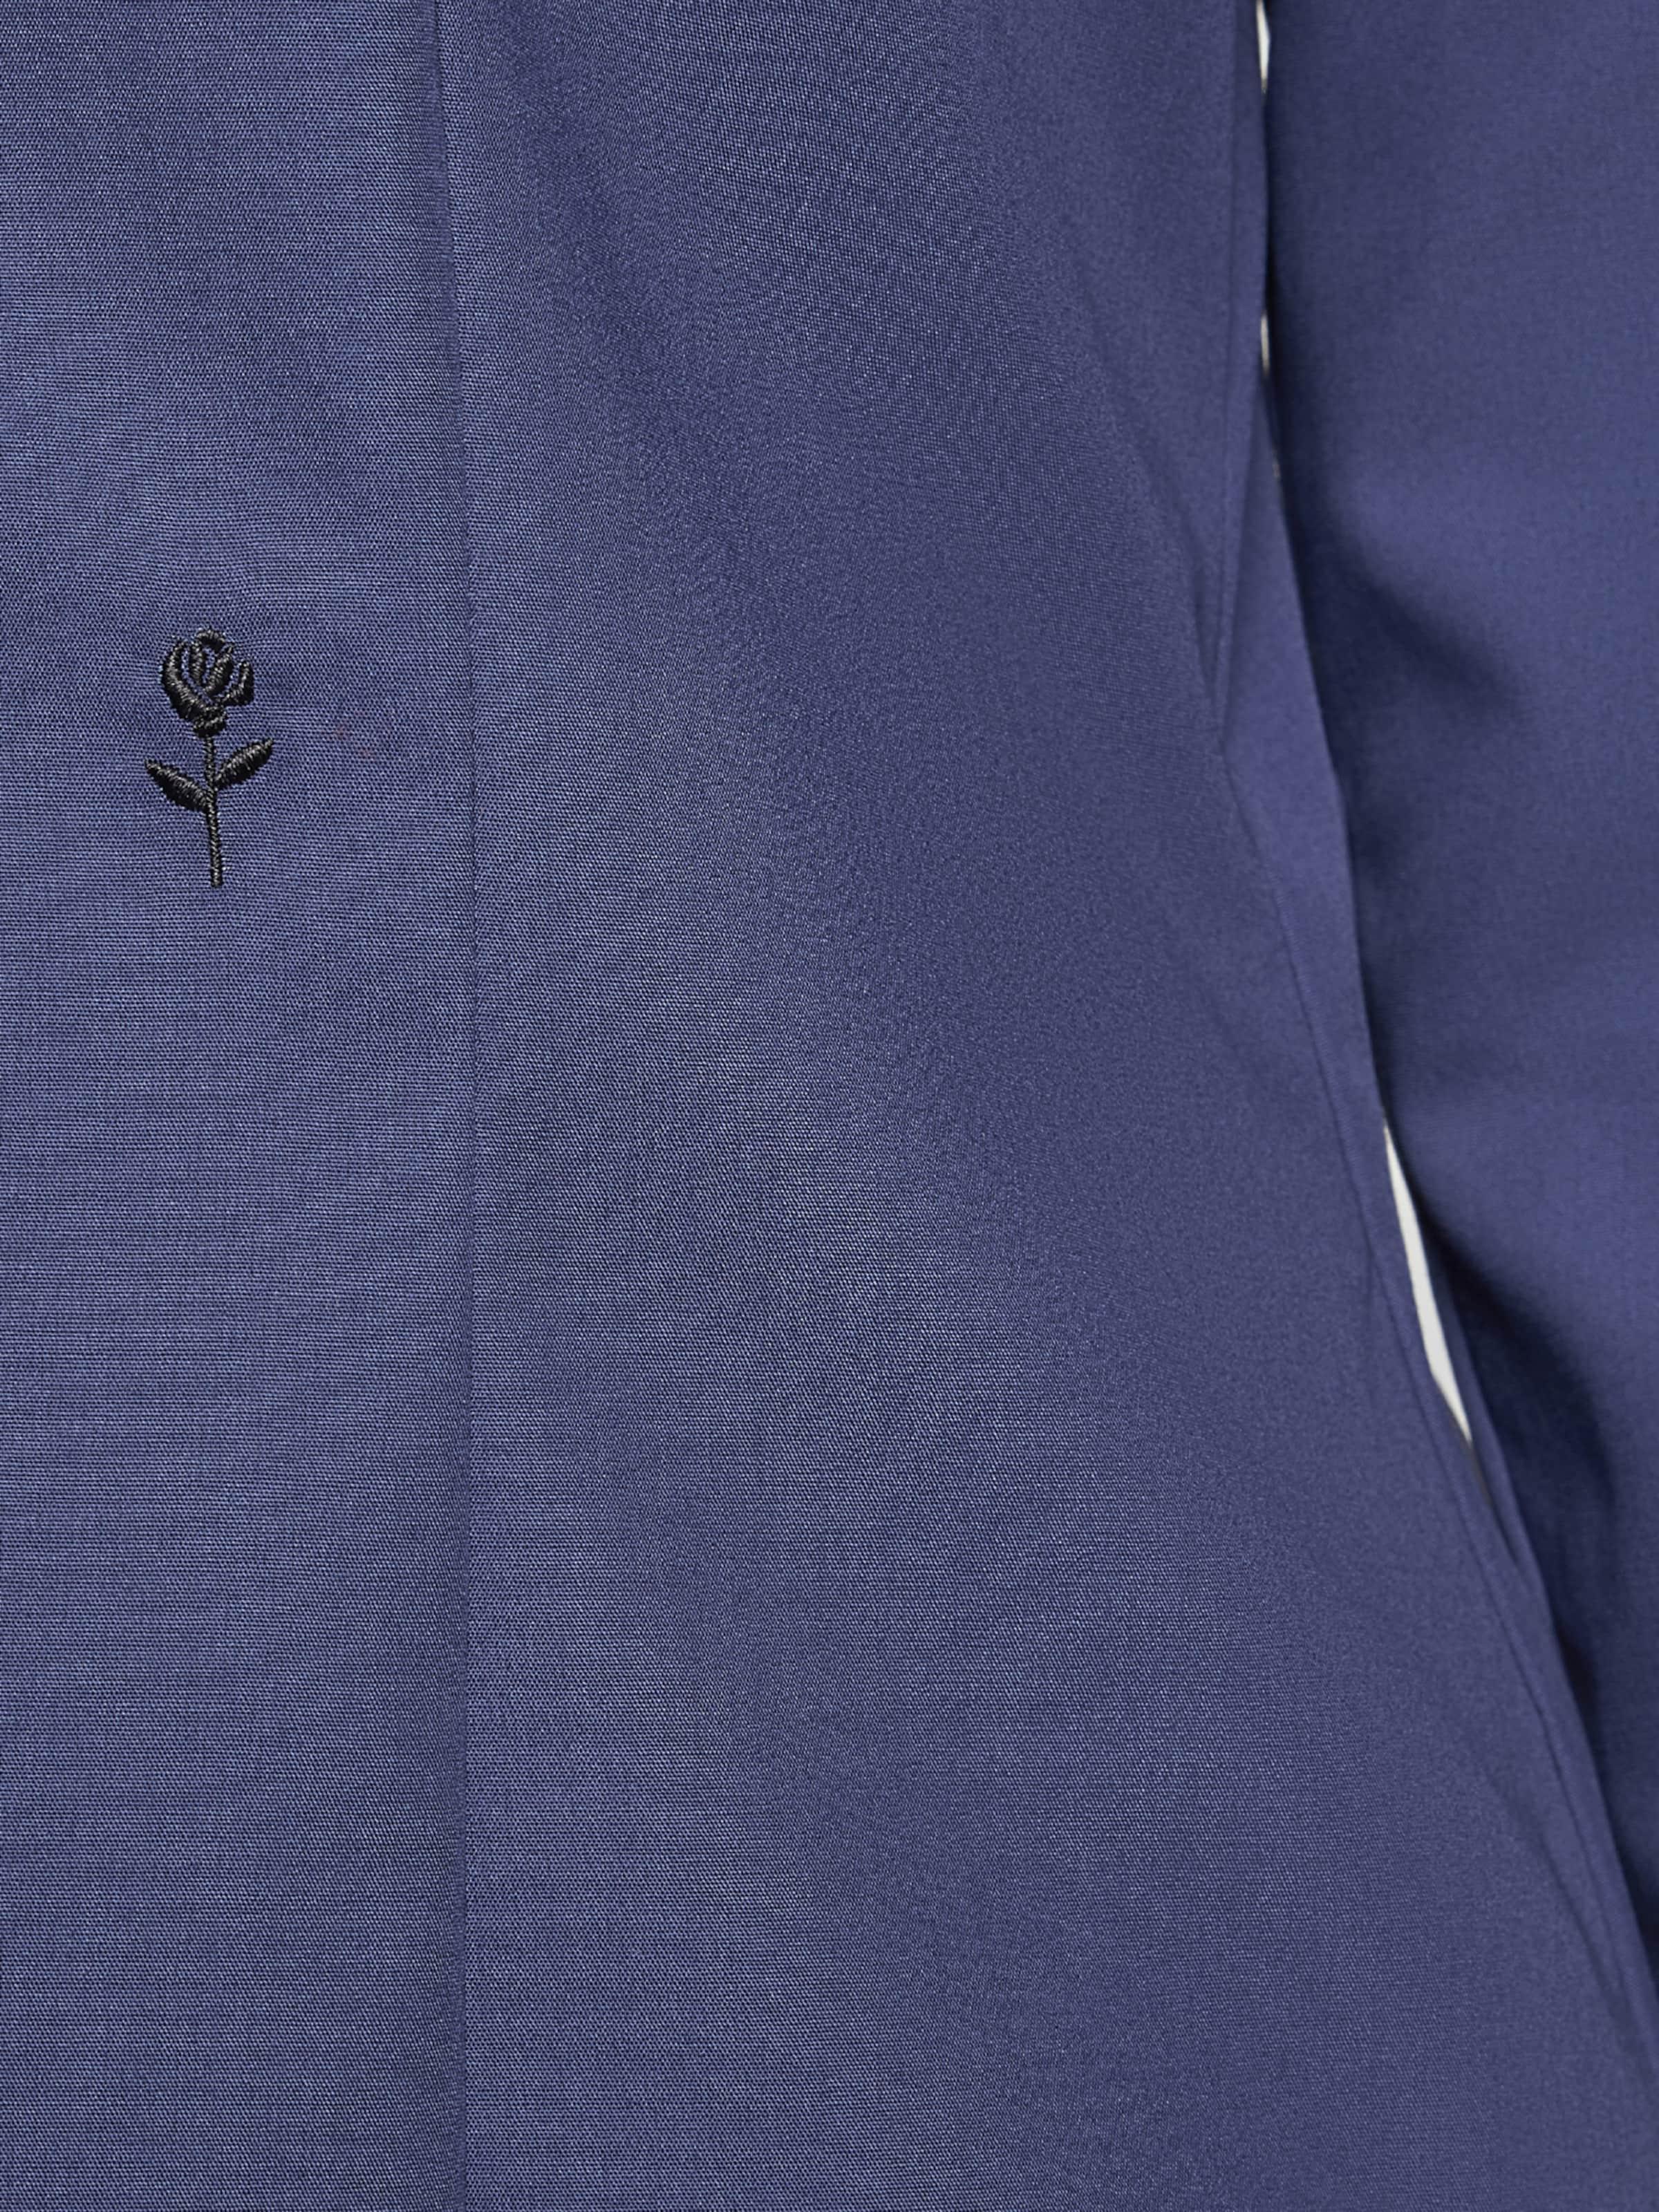 Bluse Dunkelblau In Dunkelblau Seidensticker In Bluse In Seidensticker Bluse Seidensticker 8wPX0Okn